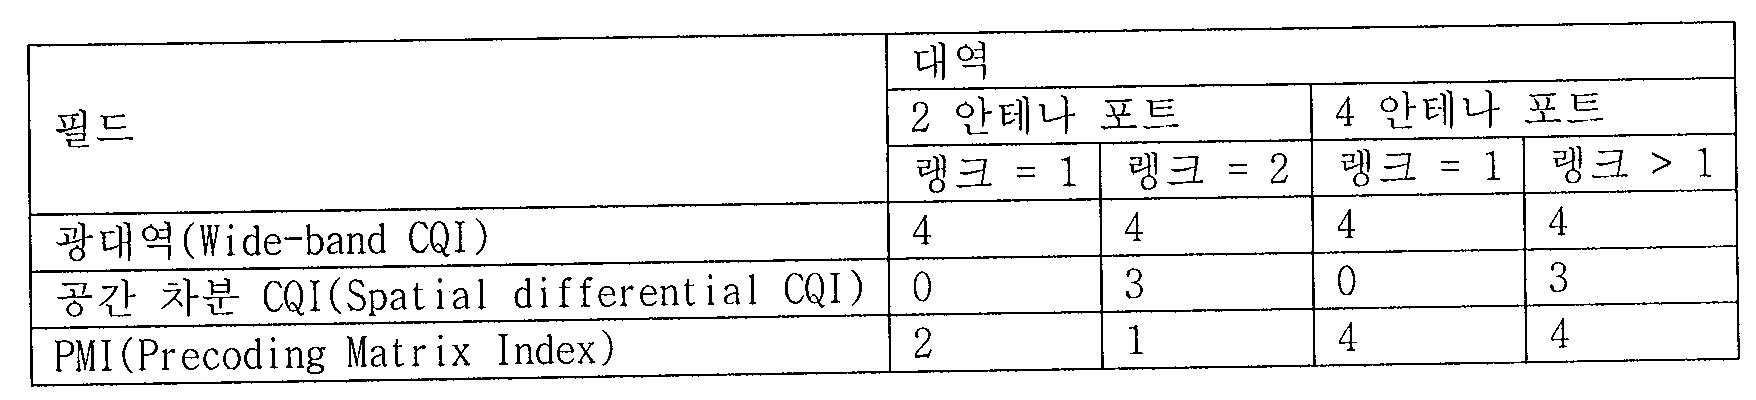 Figure 112011502155947-pat00020